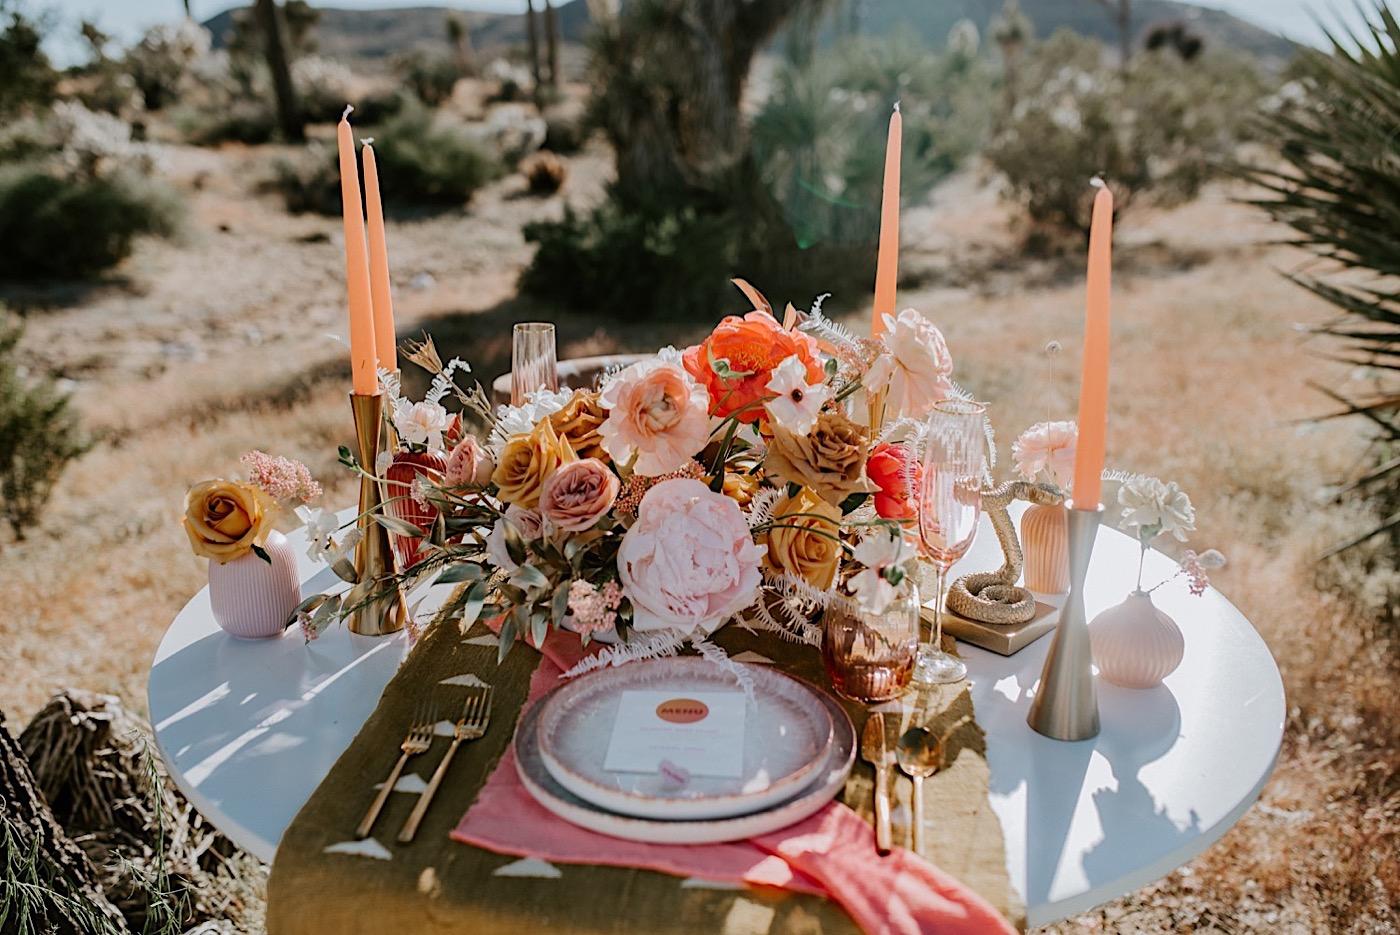 Palm Springs Elopement Los Angeles Elopement Photographer Desert Elopement 07